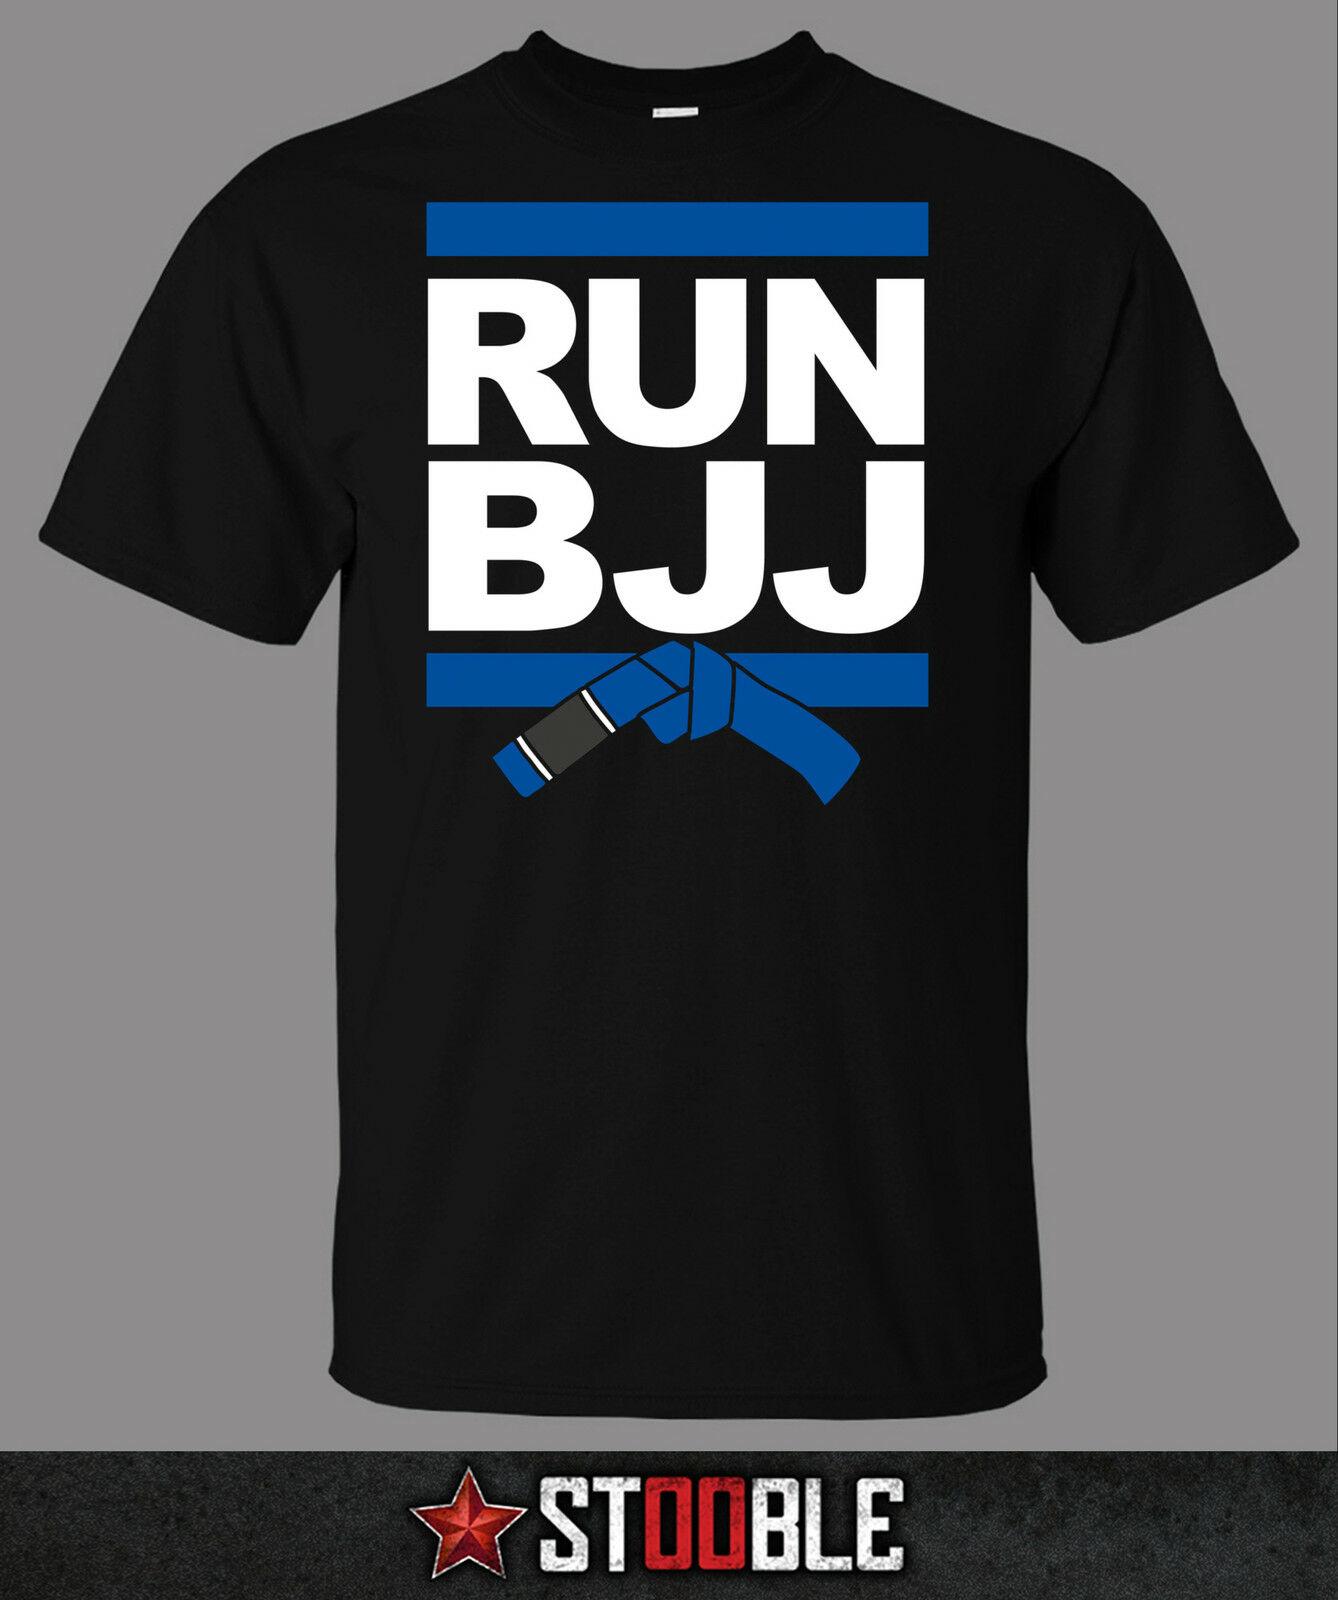 BJJ Jiu Jitsu brasileño cinturón azul camiseta-directo de almacenista Casual orgullo t camisa de los hombres de moda Unisex camiseta libre